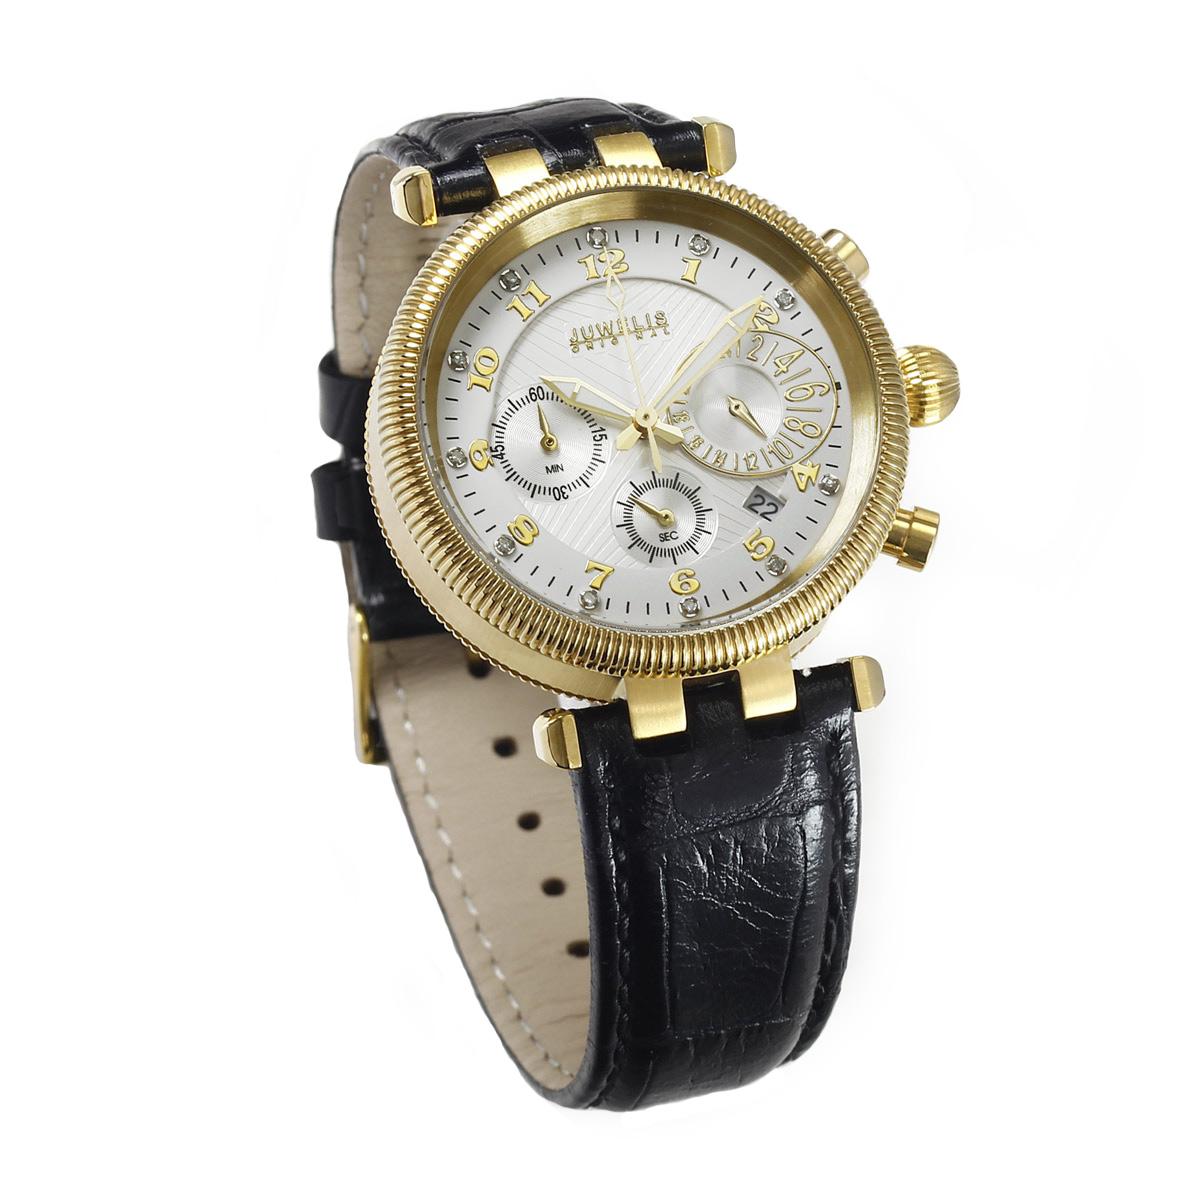 Juwelis Hera Diamond Damenuhr JW7218GW Chronograph Diamanten